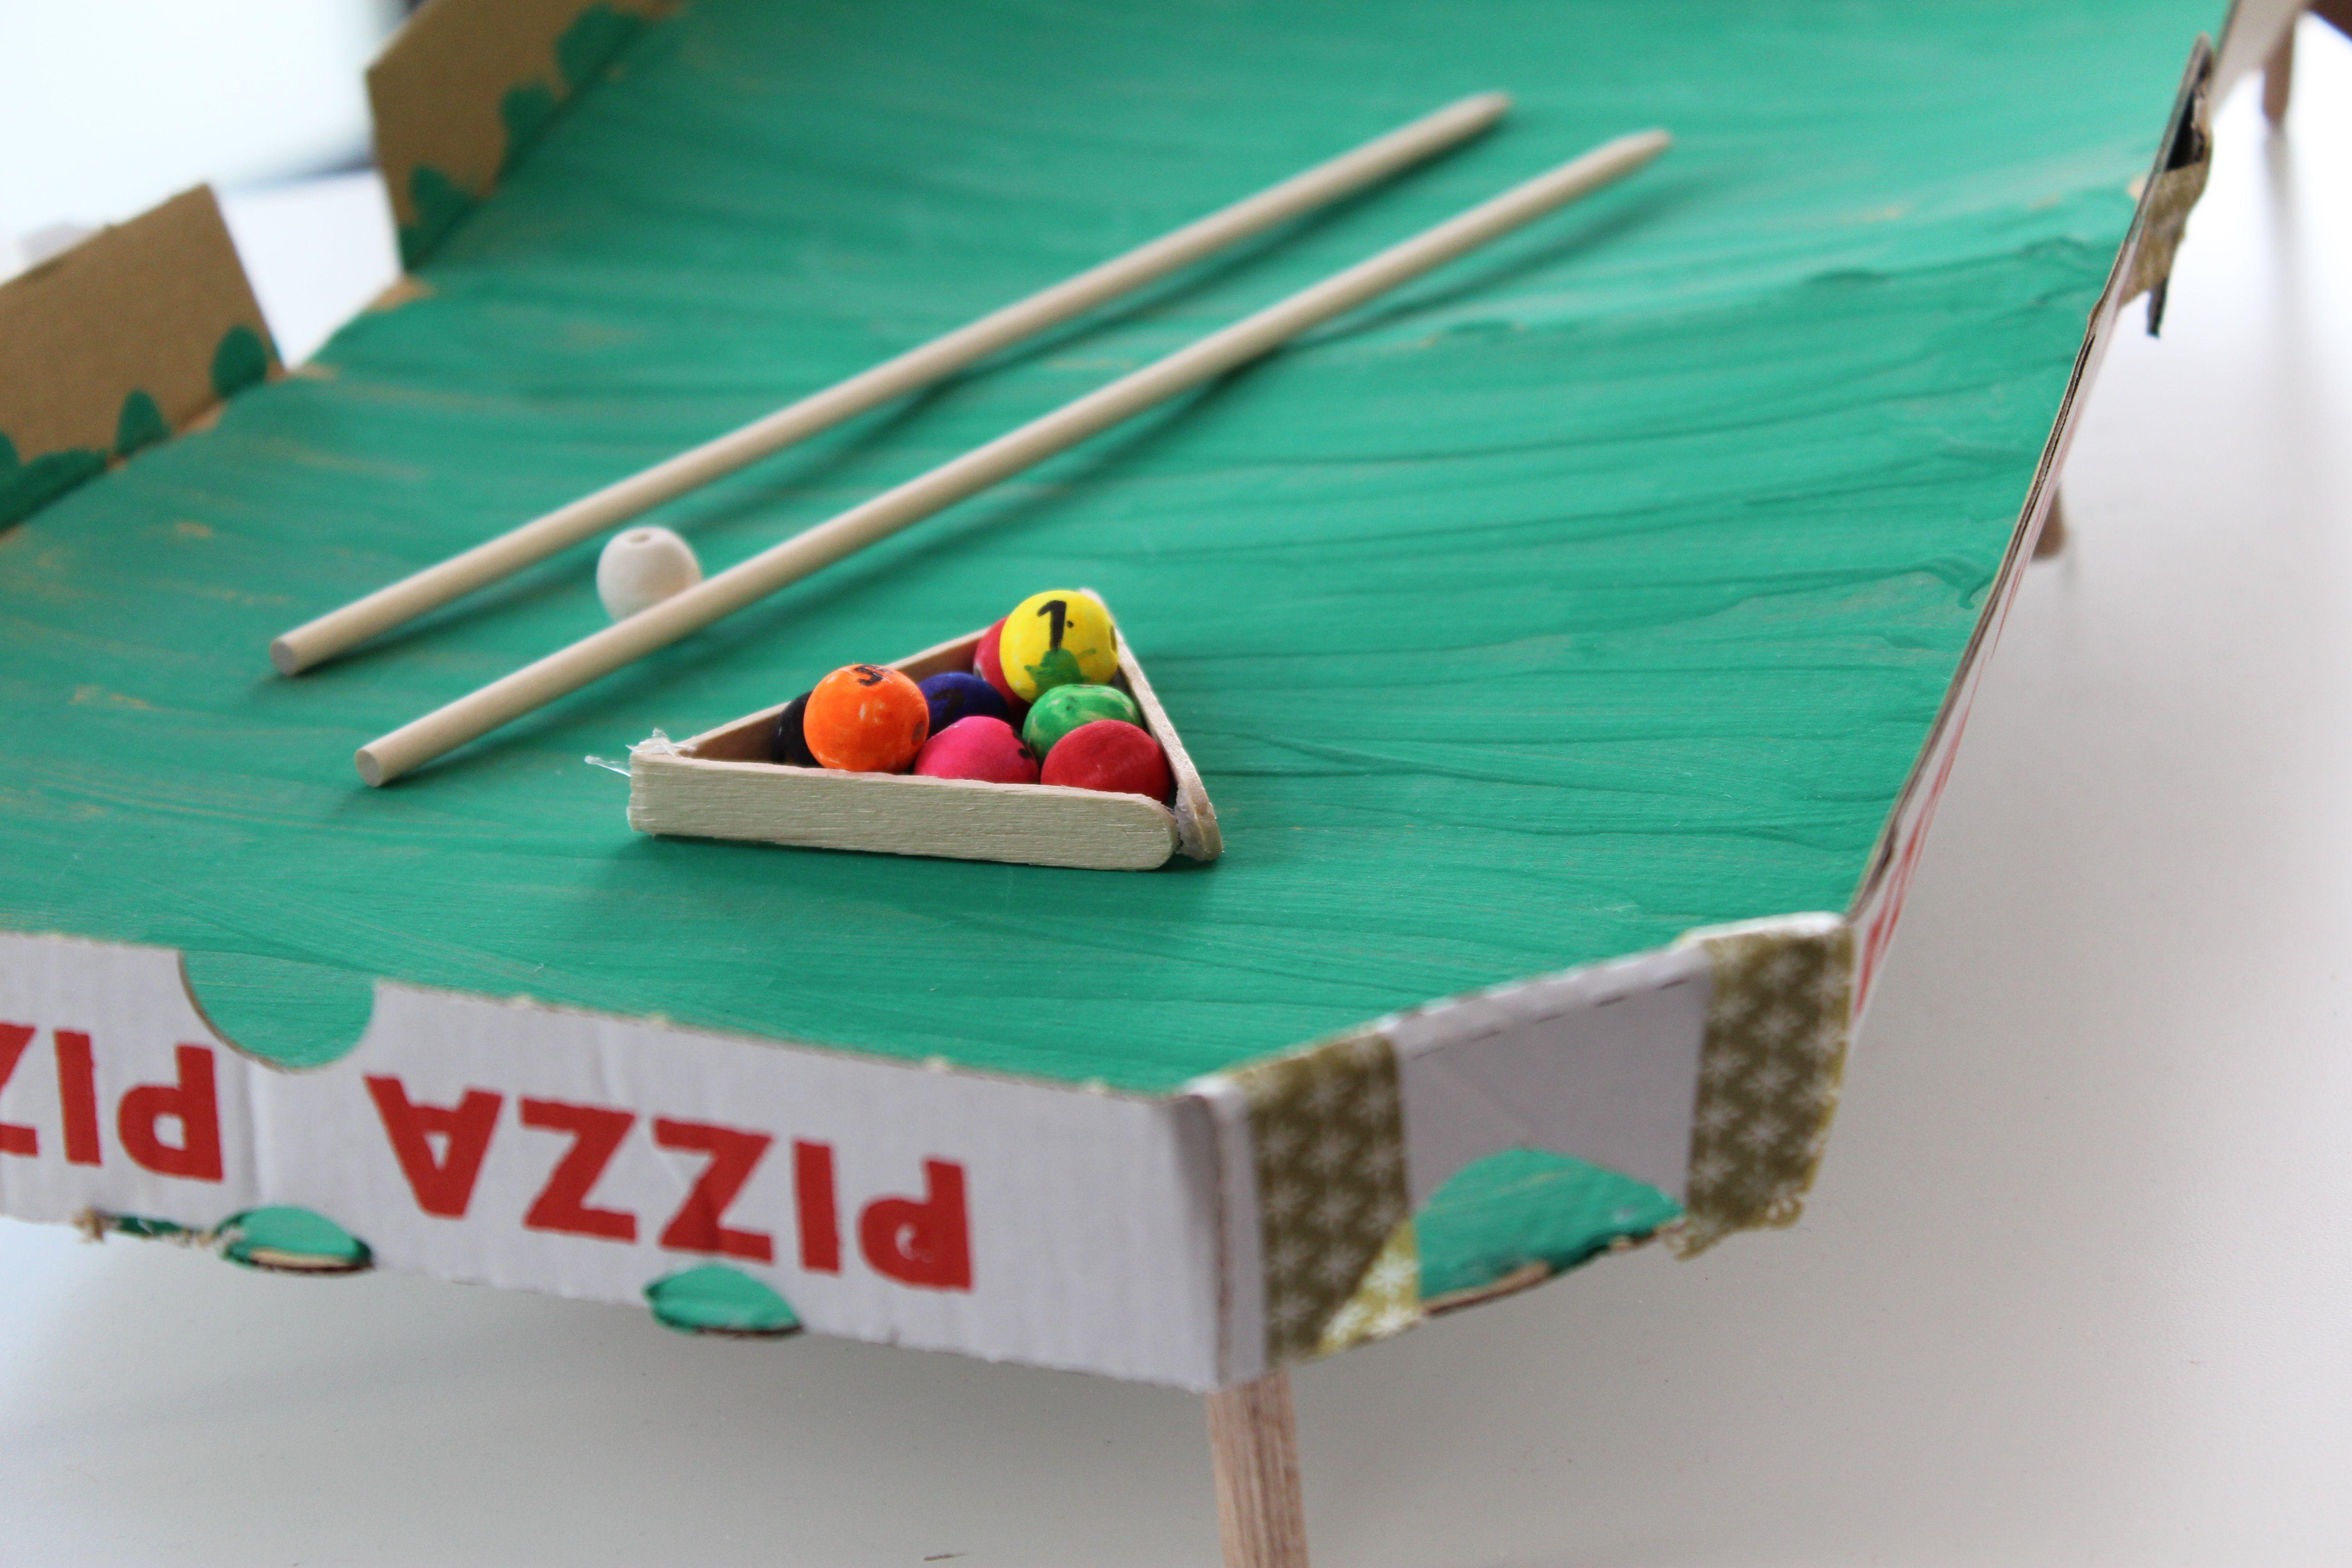 La Chaise Longue Billard spiele basteln aus pizzakartons: billard | diy for kids